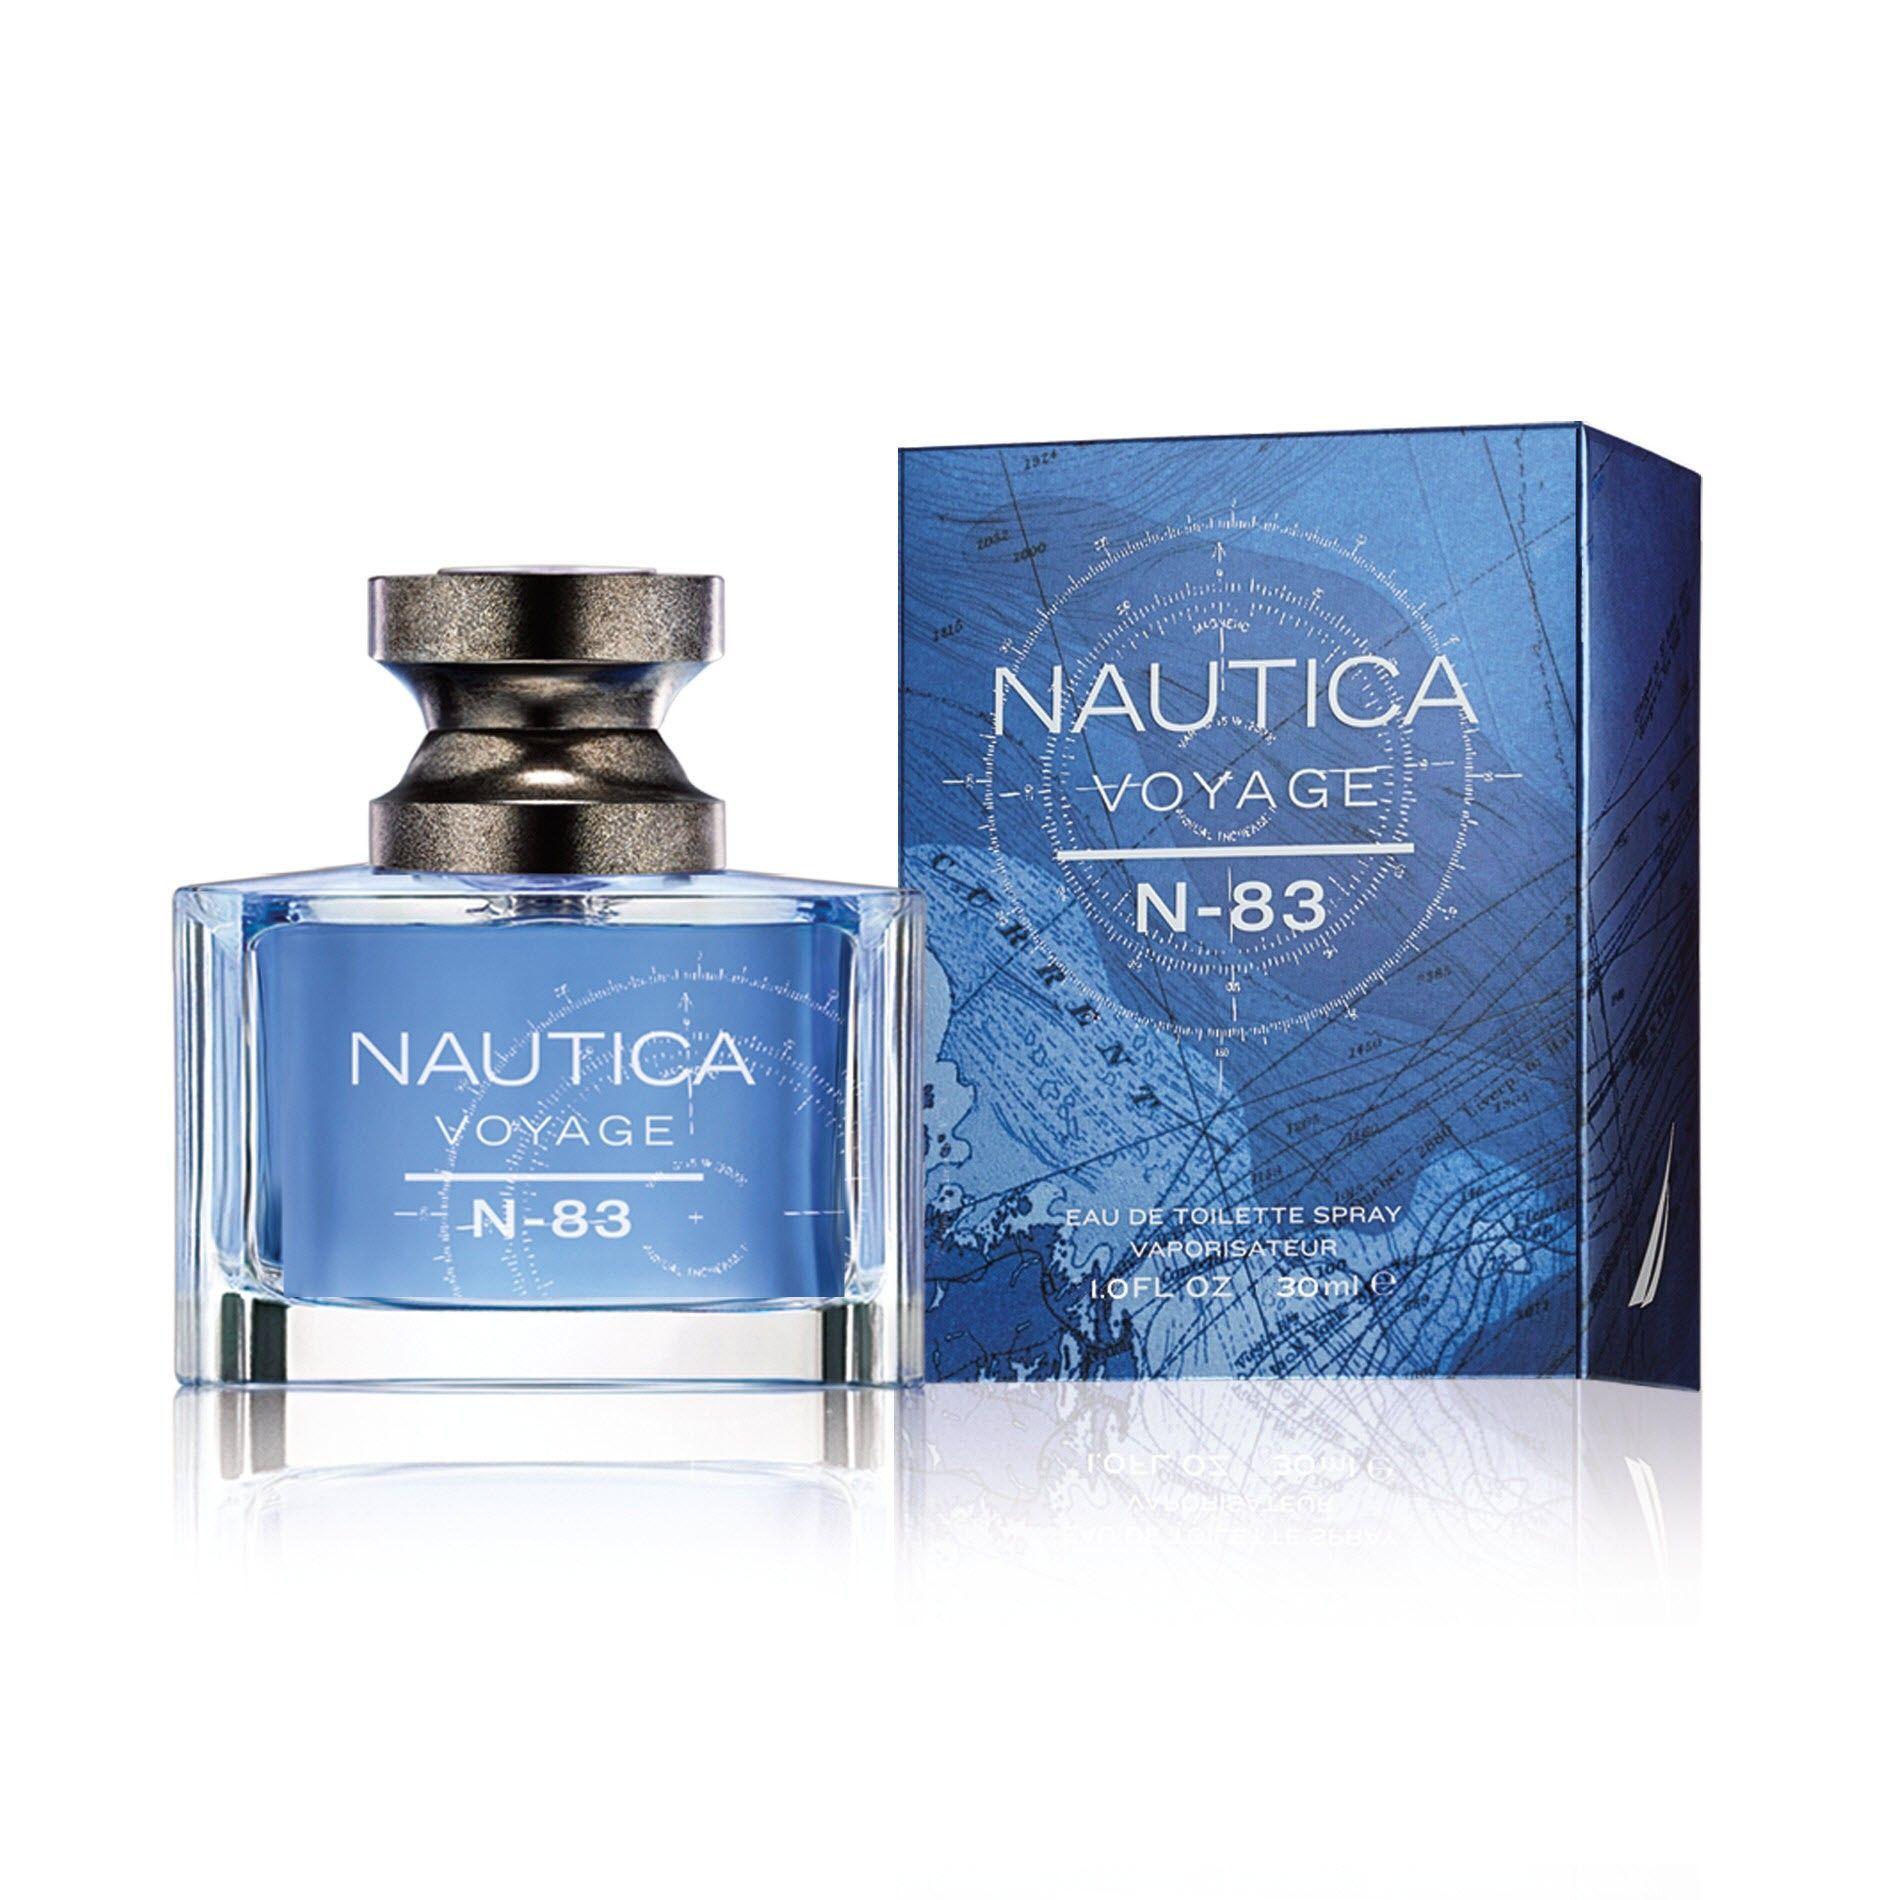 Nautica Voyage N83 Eau de Toilette 30 ml Spray